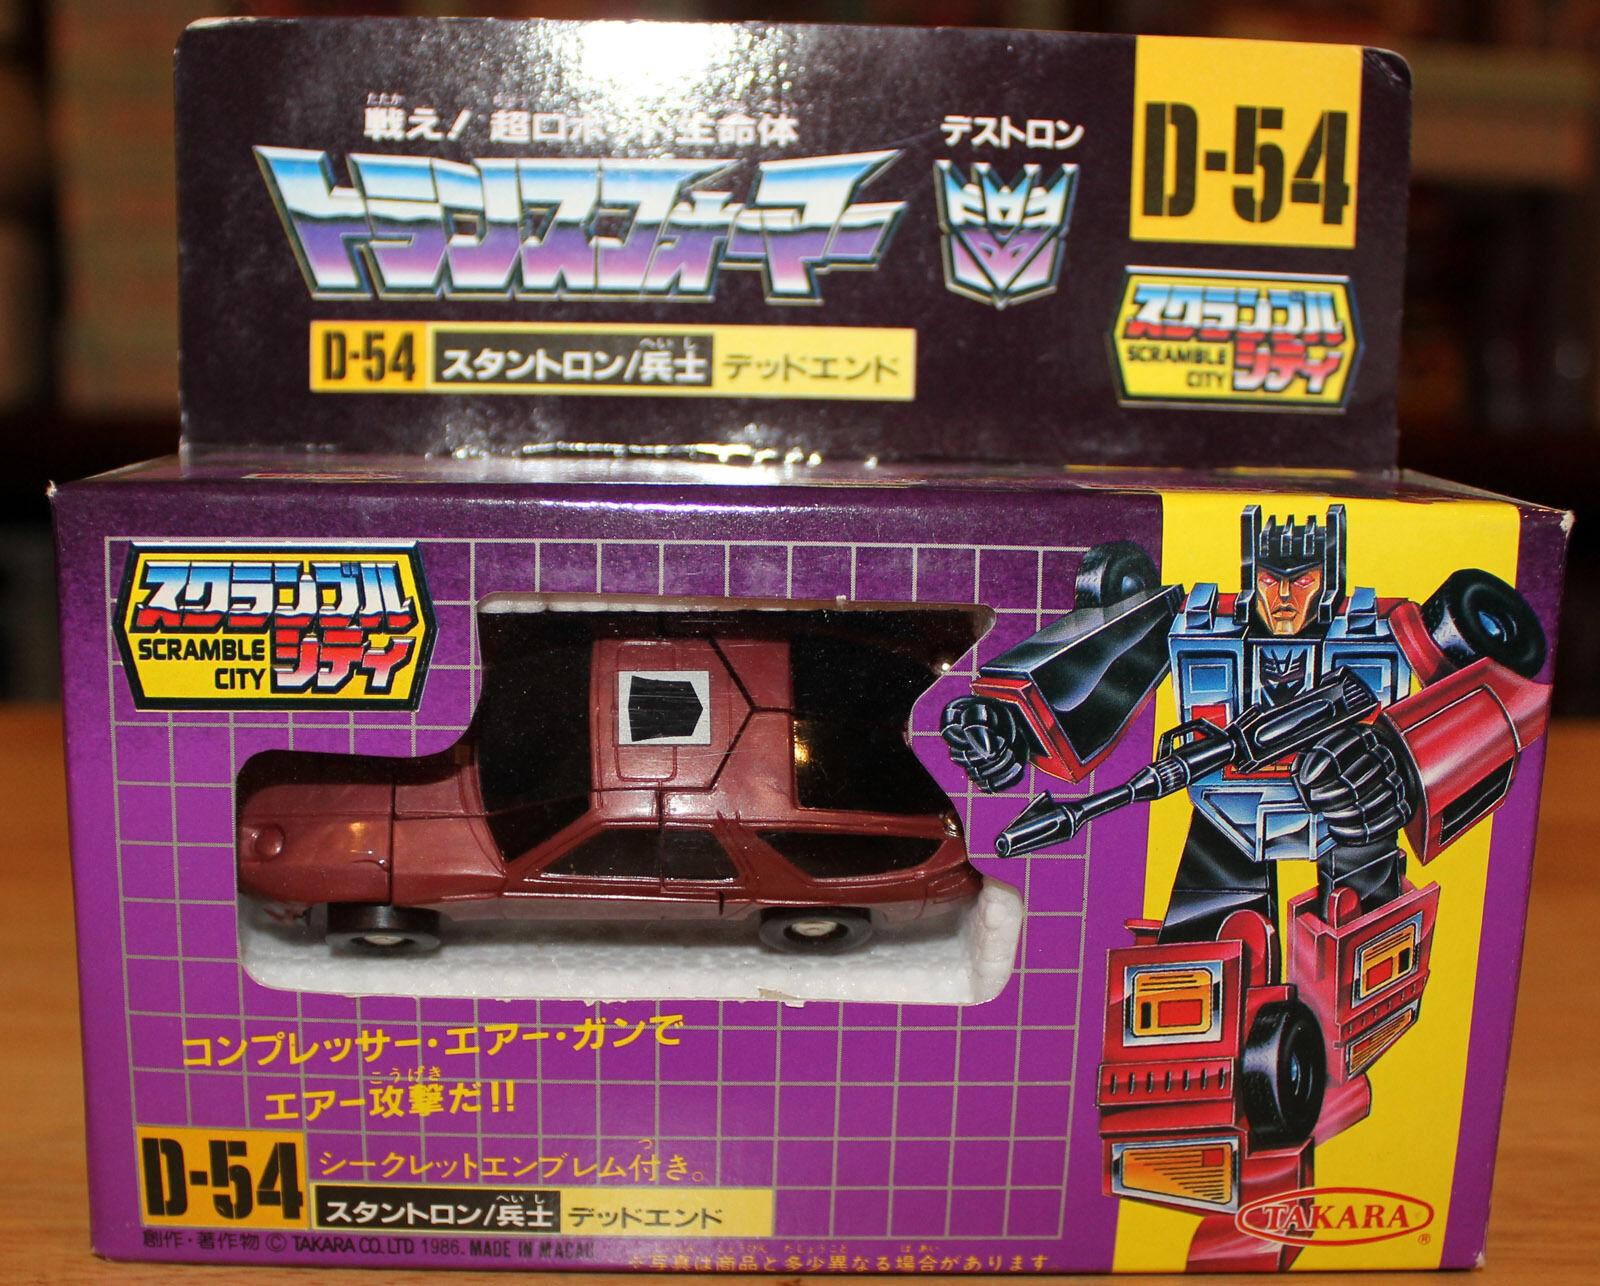 1986 Takara Transformers G1 Series 3 Stunticon Deadend D-54 Scramble City MISB